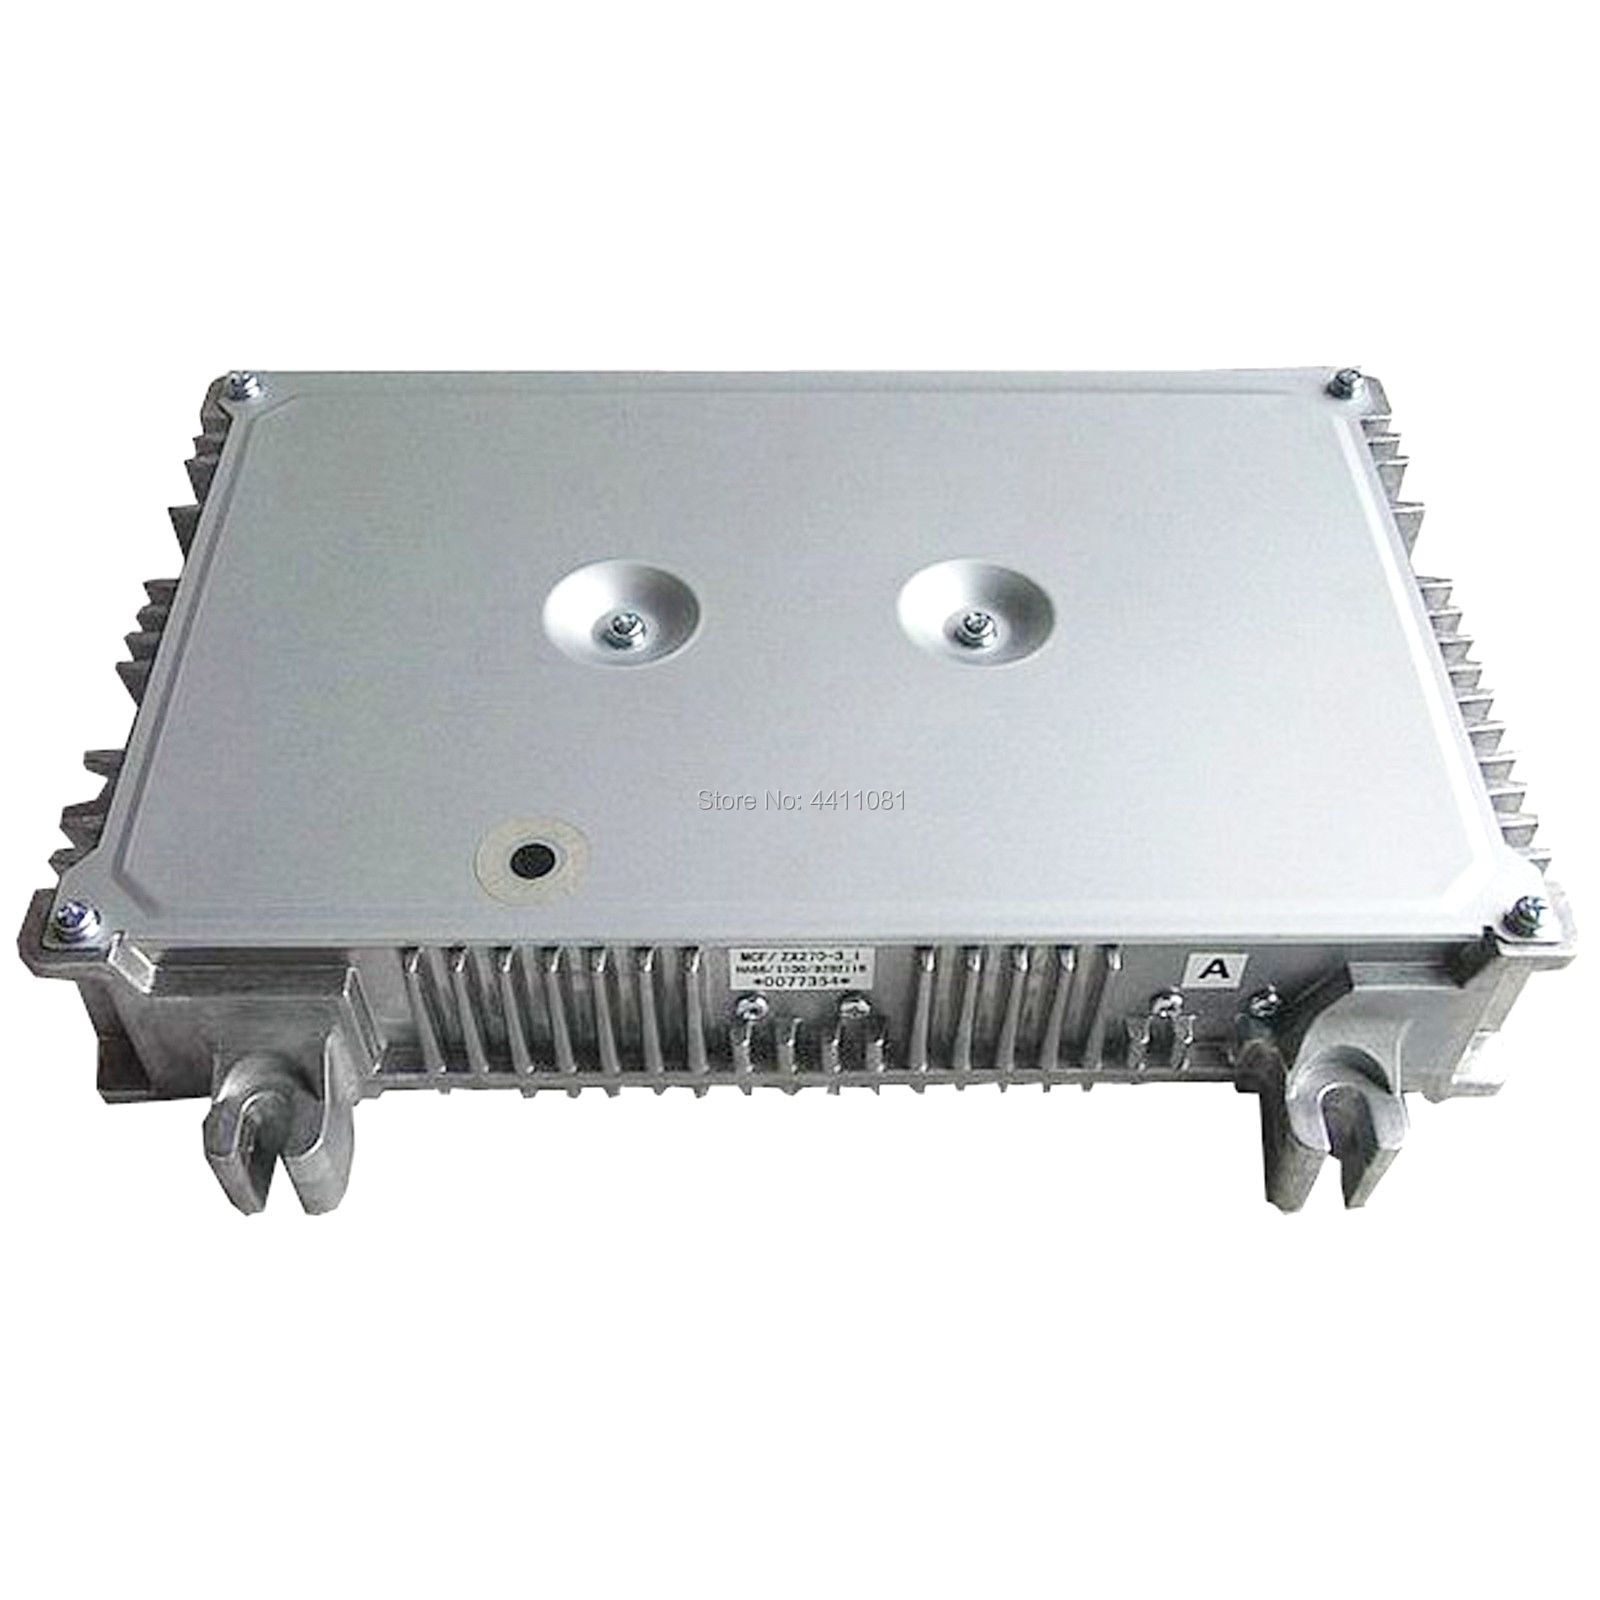 ZX225US تحكم 4452332 ل منقب هيتاشي التحكم لوحة ، 1 سنة الضمان